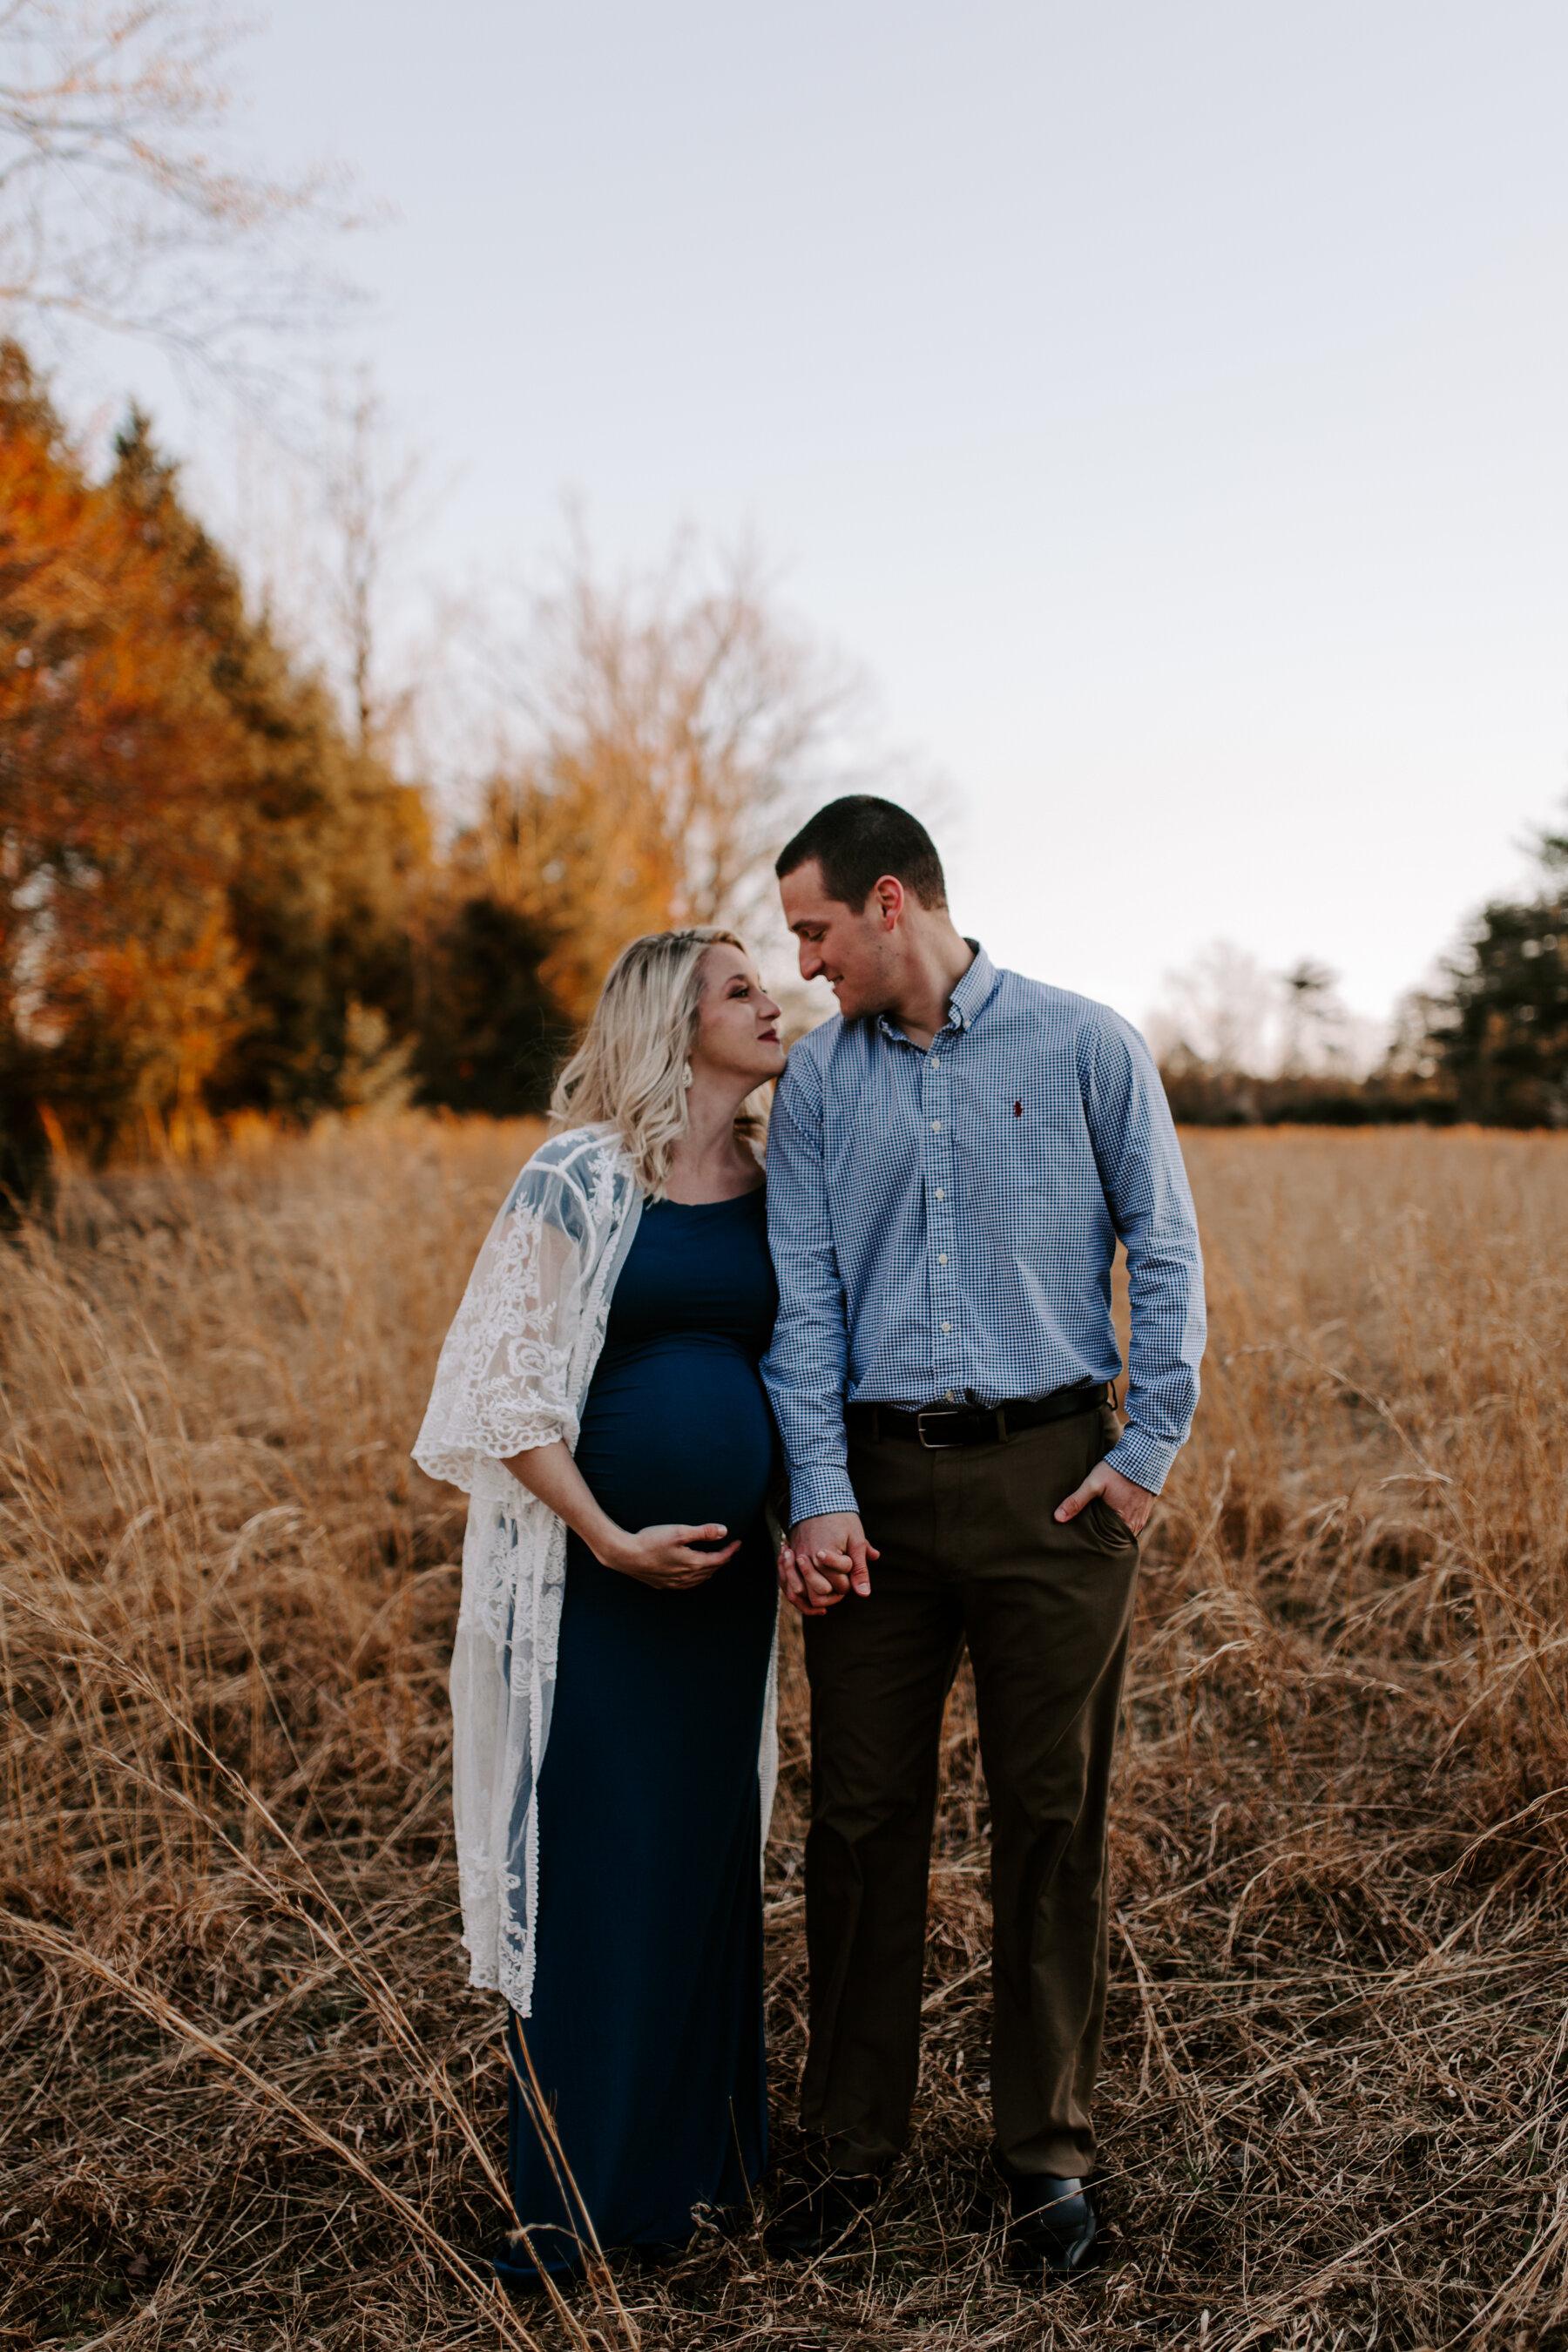 Winter Maternity Session by Kayli LaFon Photography   Kernersville, Greensboro, Winston-Salem NC Couples Photographer